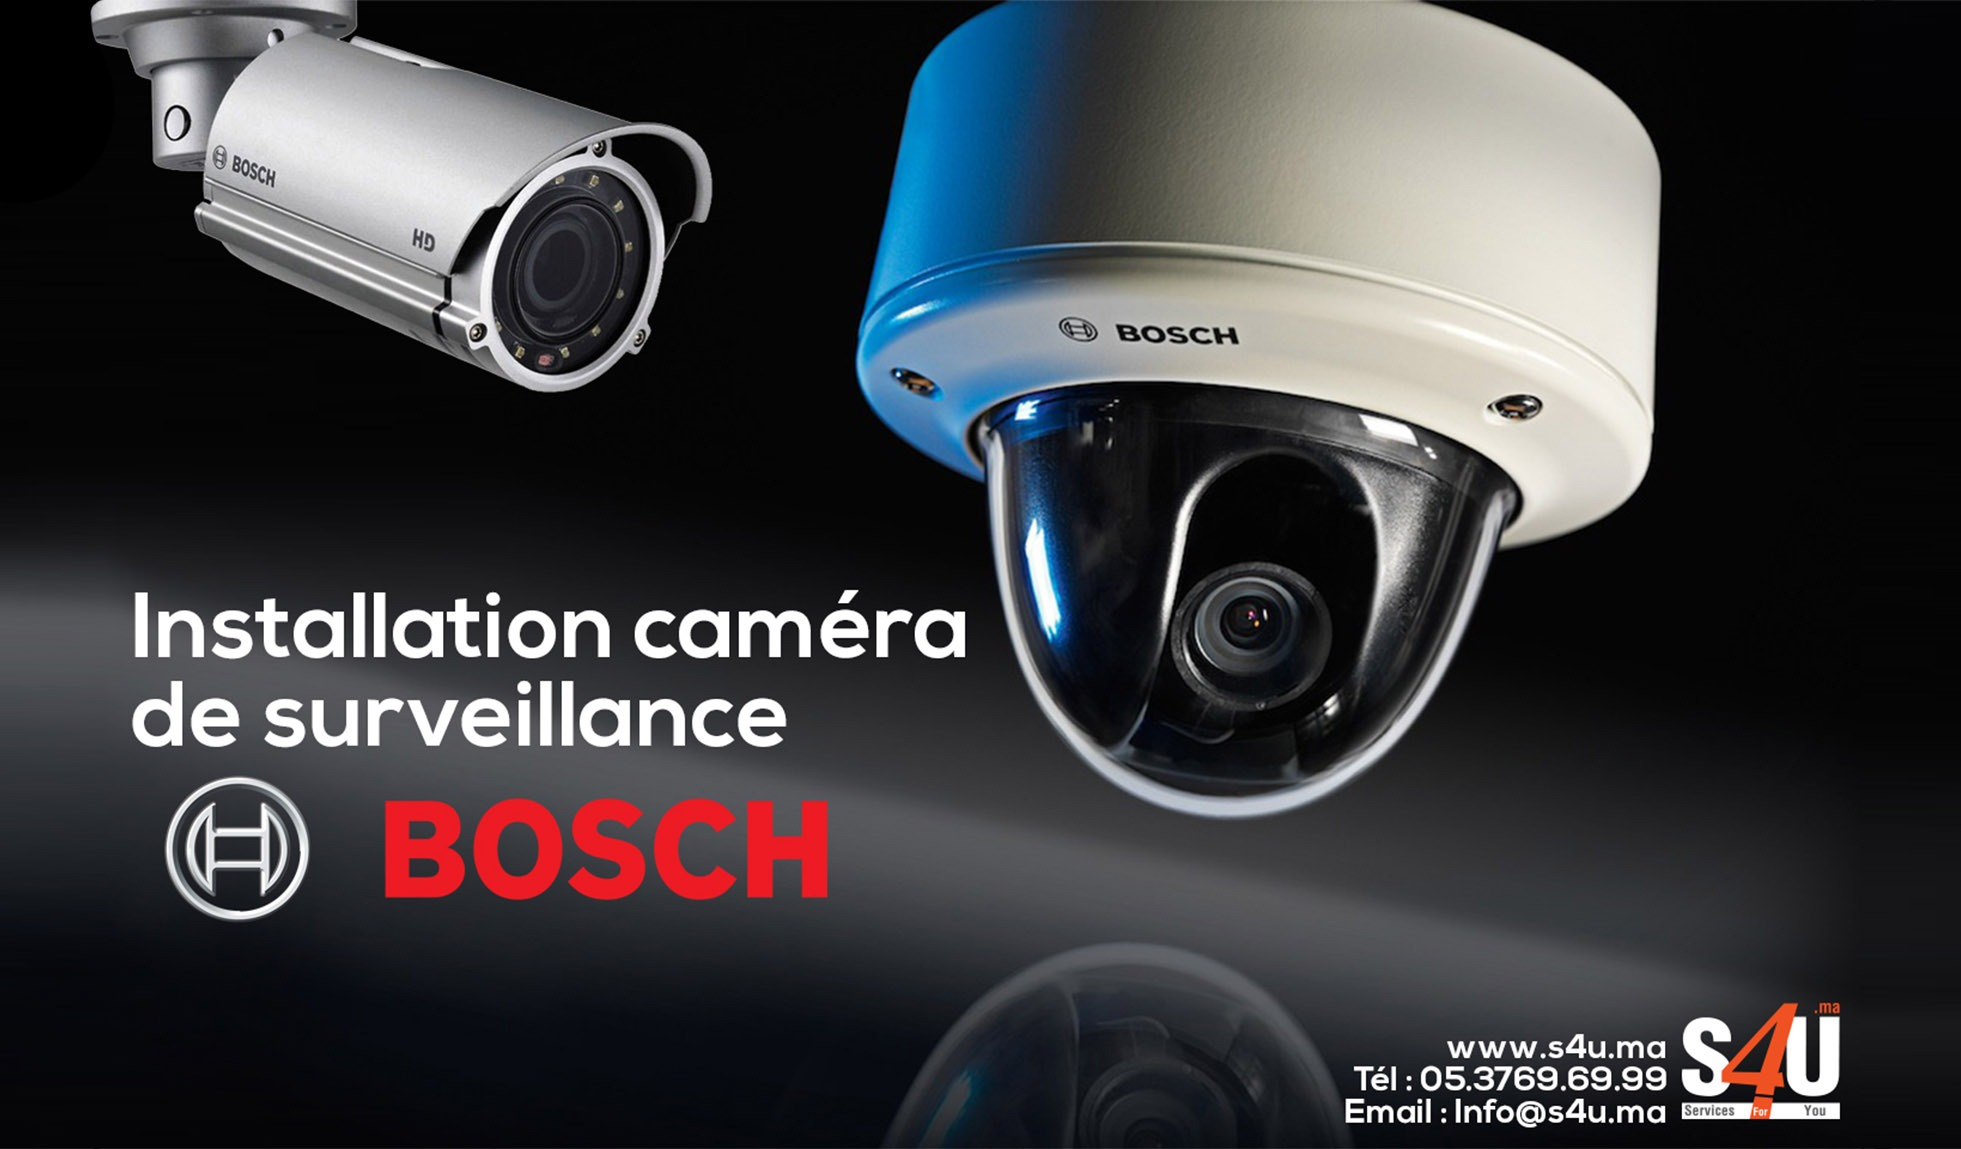 Installation-caméra-de-surveillance-BOSCH-Rbat-Casablanca-Maroc